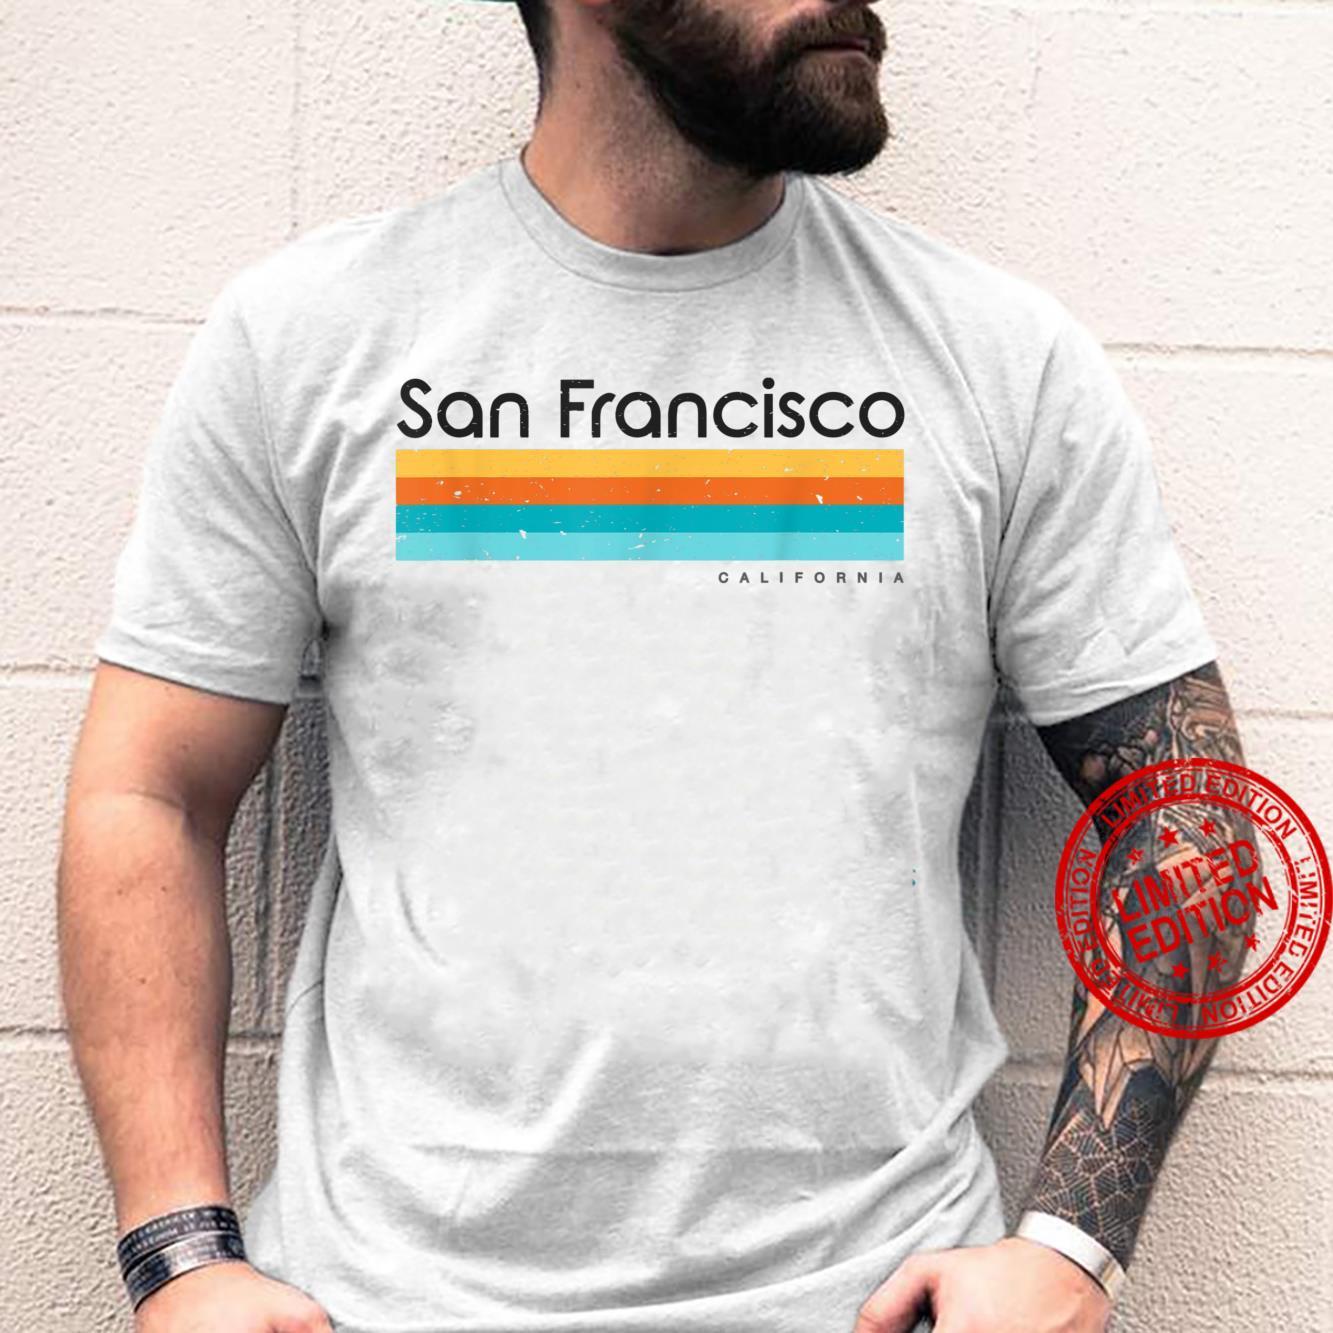 Vintage San Francisco California CA Retro Design Shirt